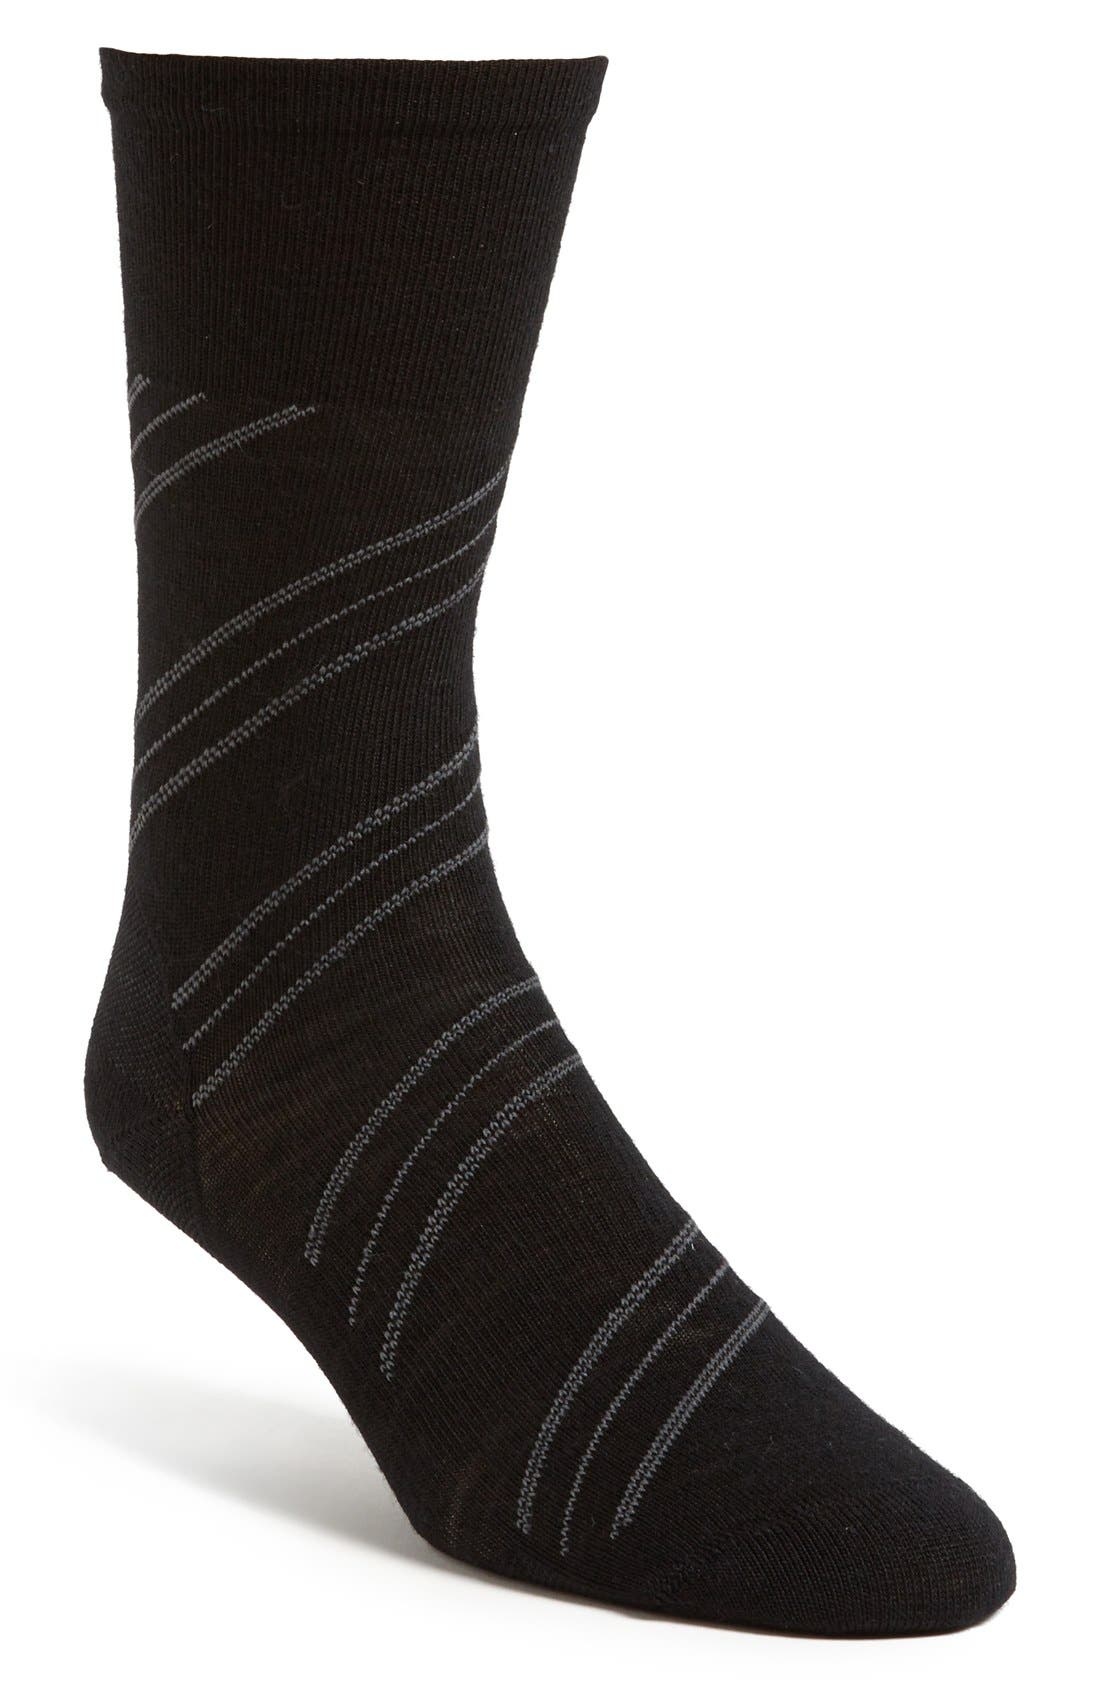 'Barber Pole' Socks,                             Main thumbnail 1, color,                             001